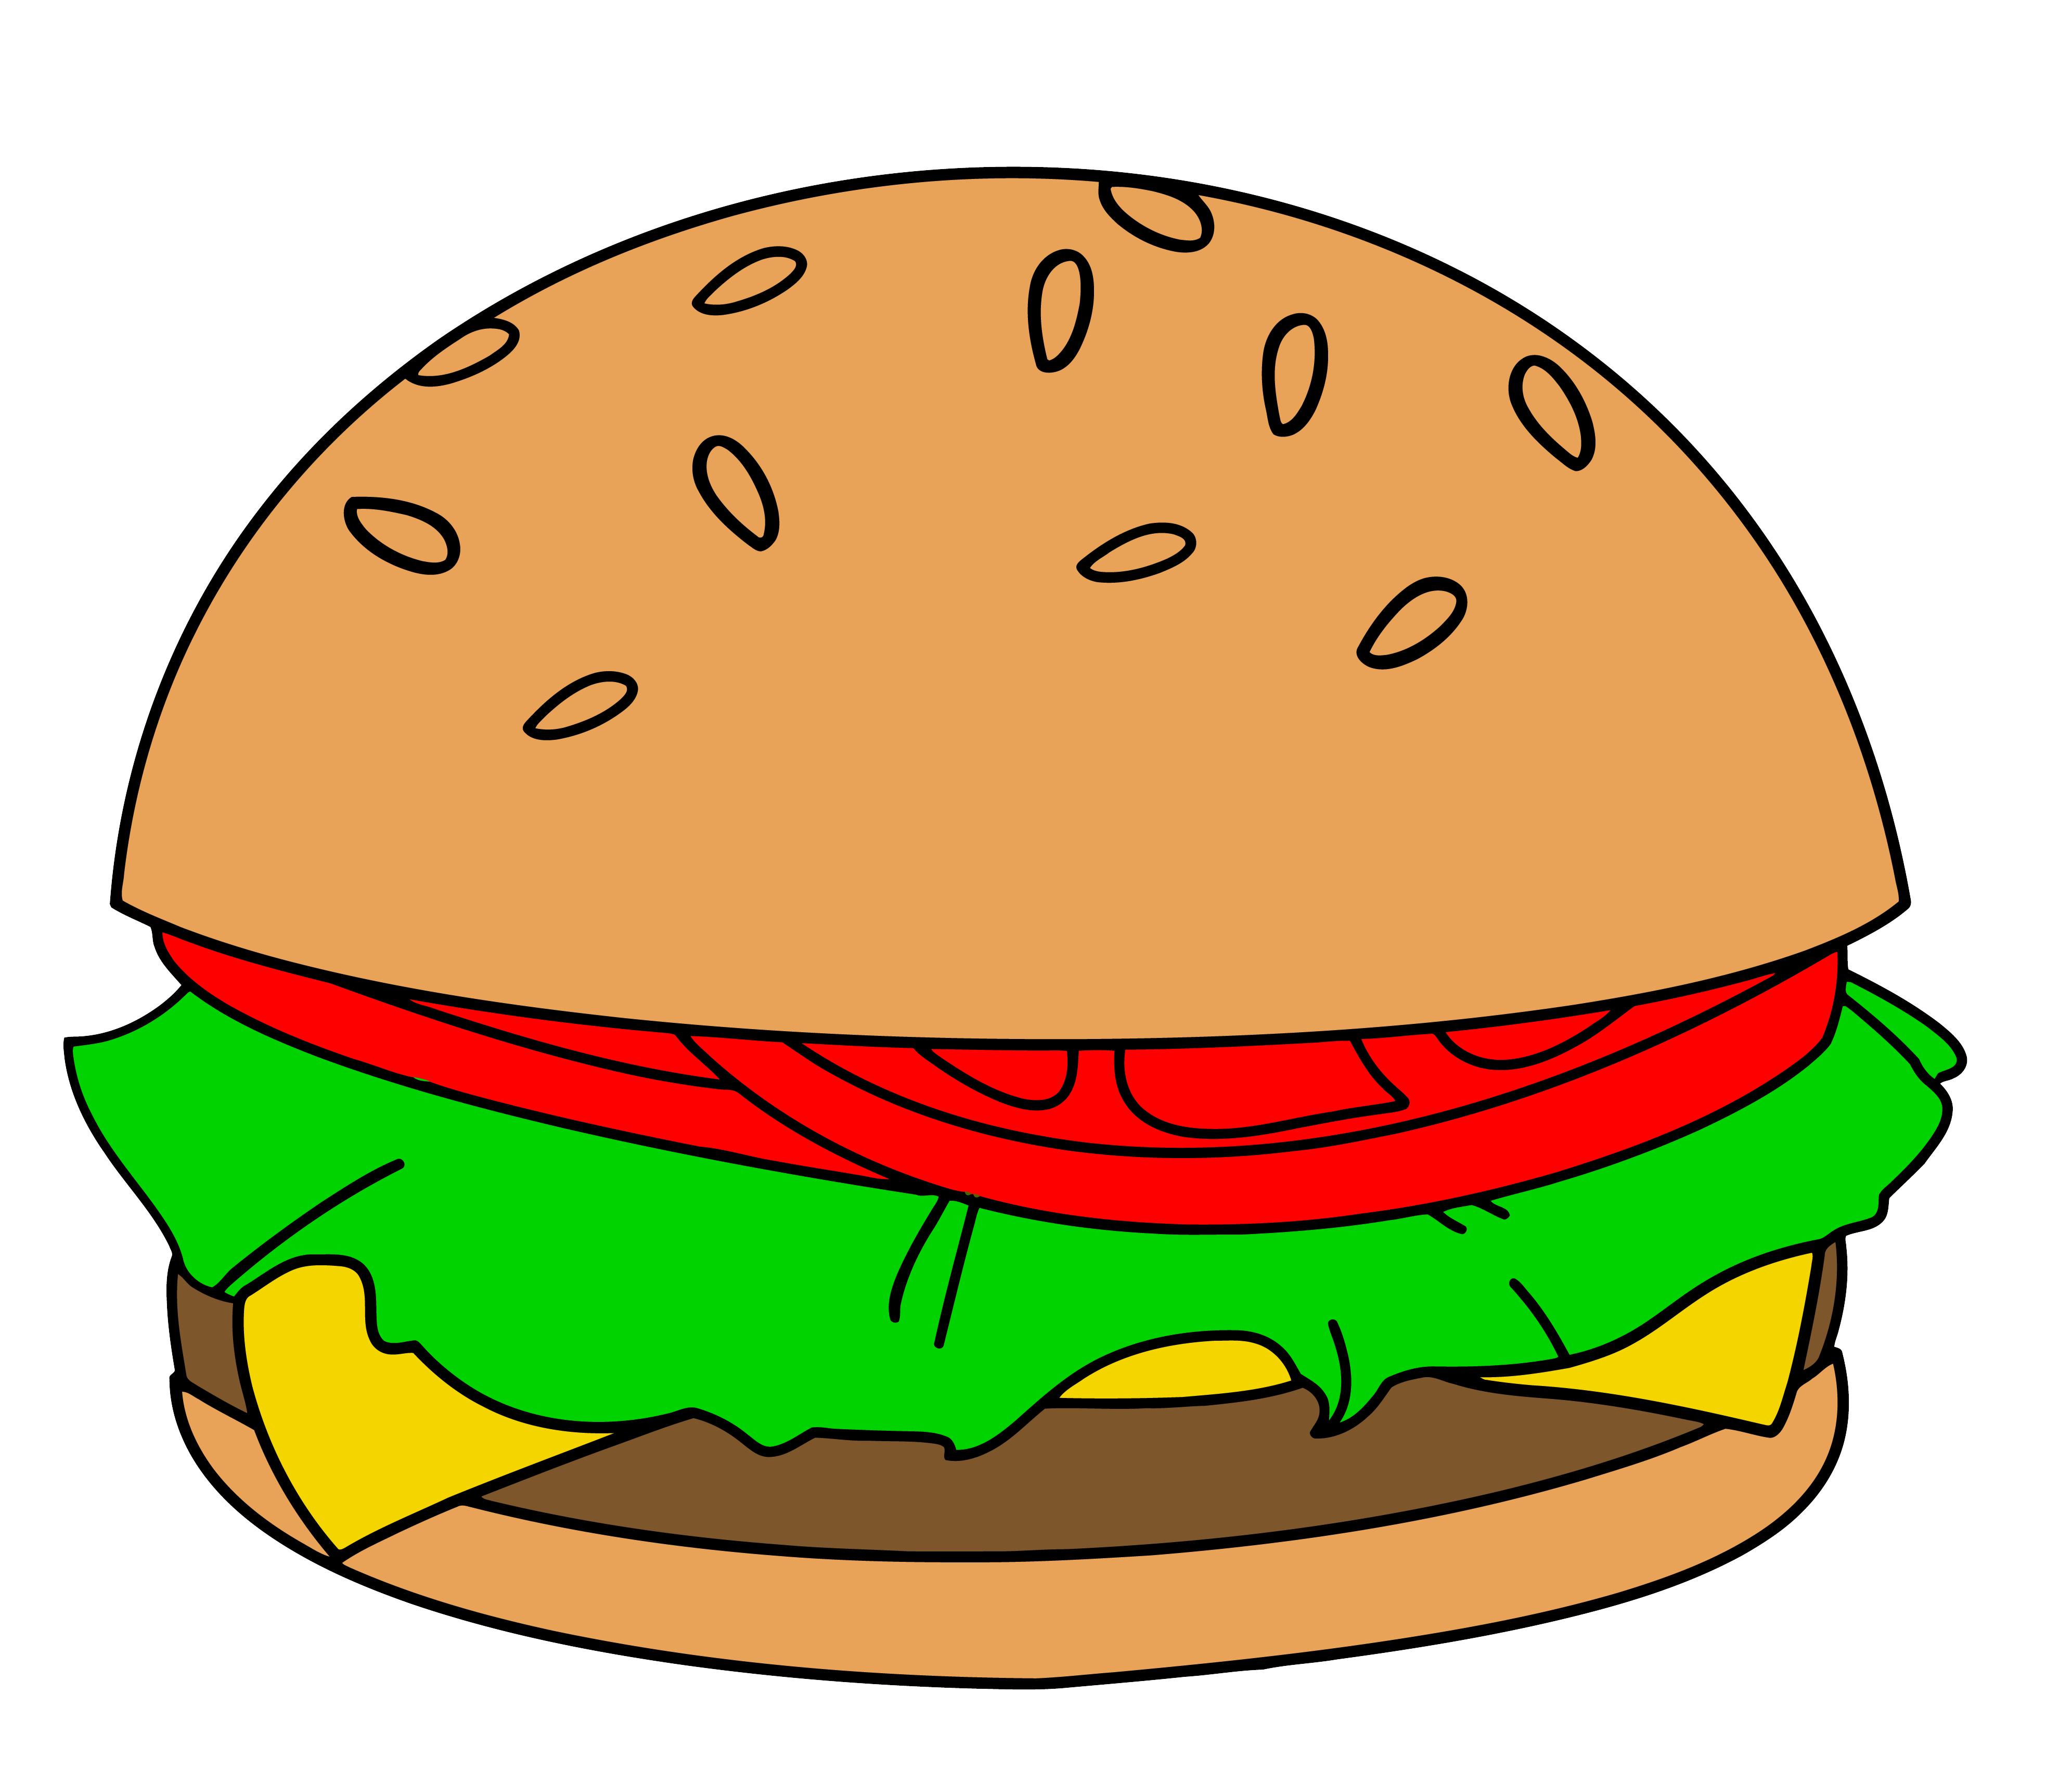 Hamburger cartoon clipart clipart suggest for Hamburger clipart